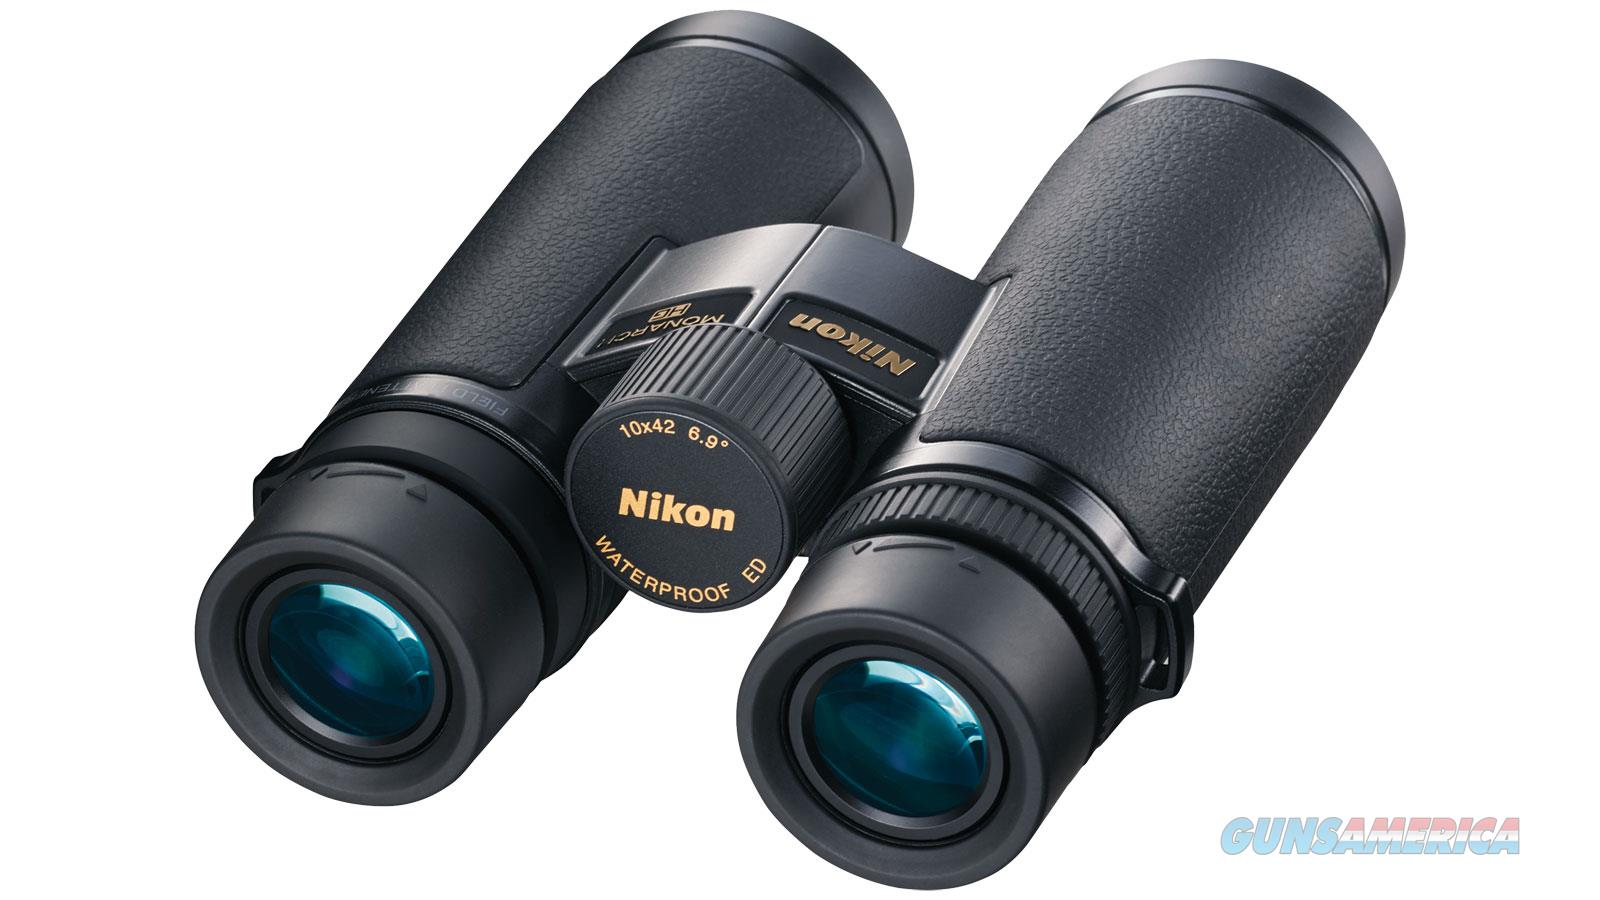 Nikon Monarch Hg 10X42 16028  Non-Guns > Scopes/Mounts/Rings & Optics > Non-Scope Optics > Binoculars